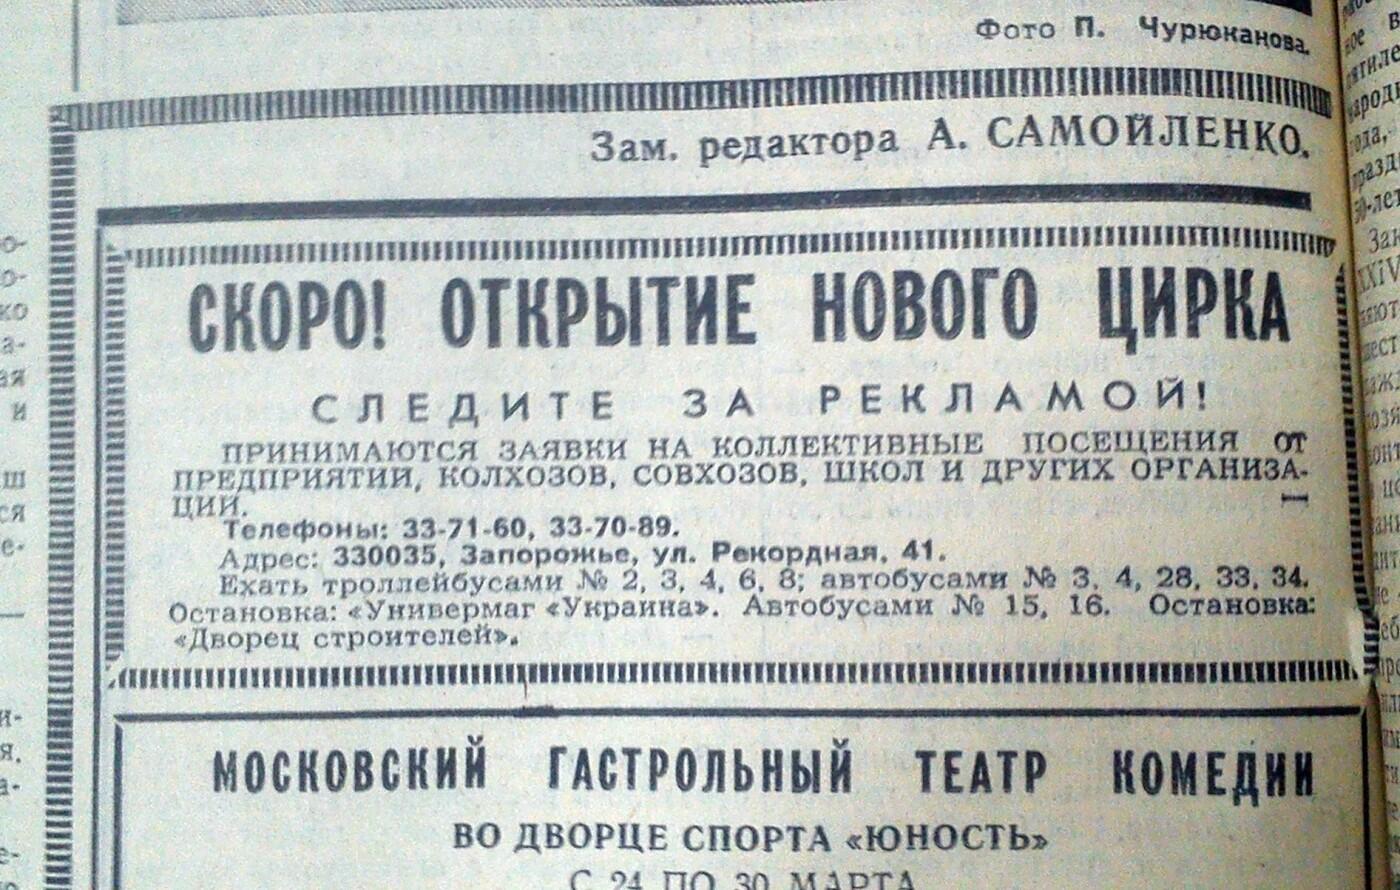 """Работали под самыми облаками"": как в Запорожье строили здание цирка, - ФОТО, фото-18"